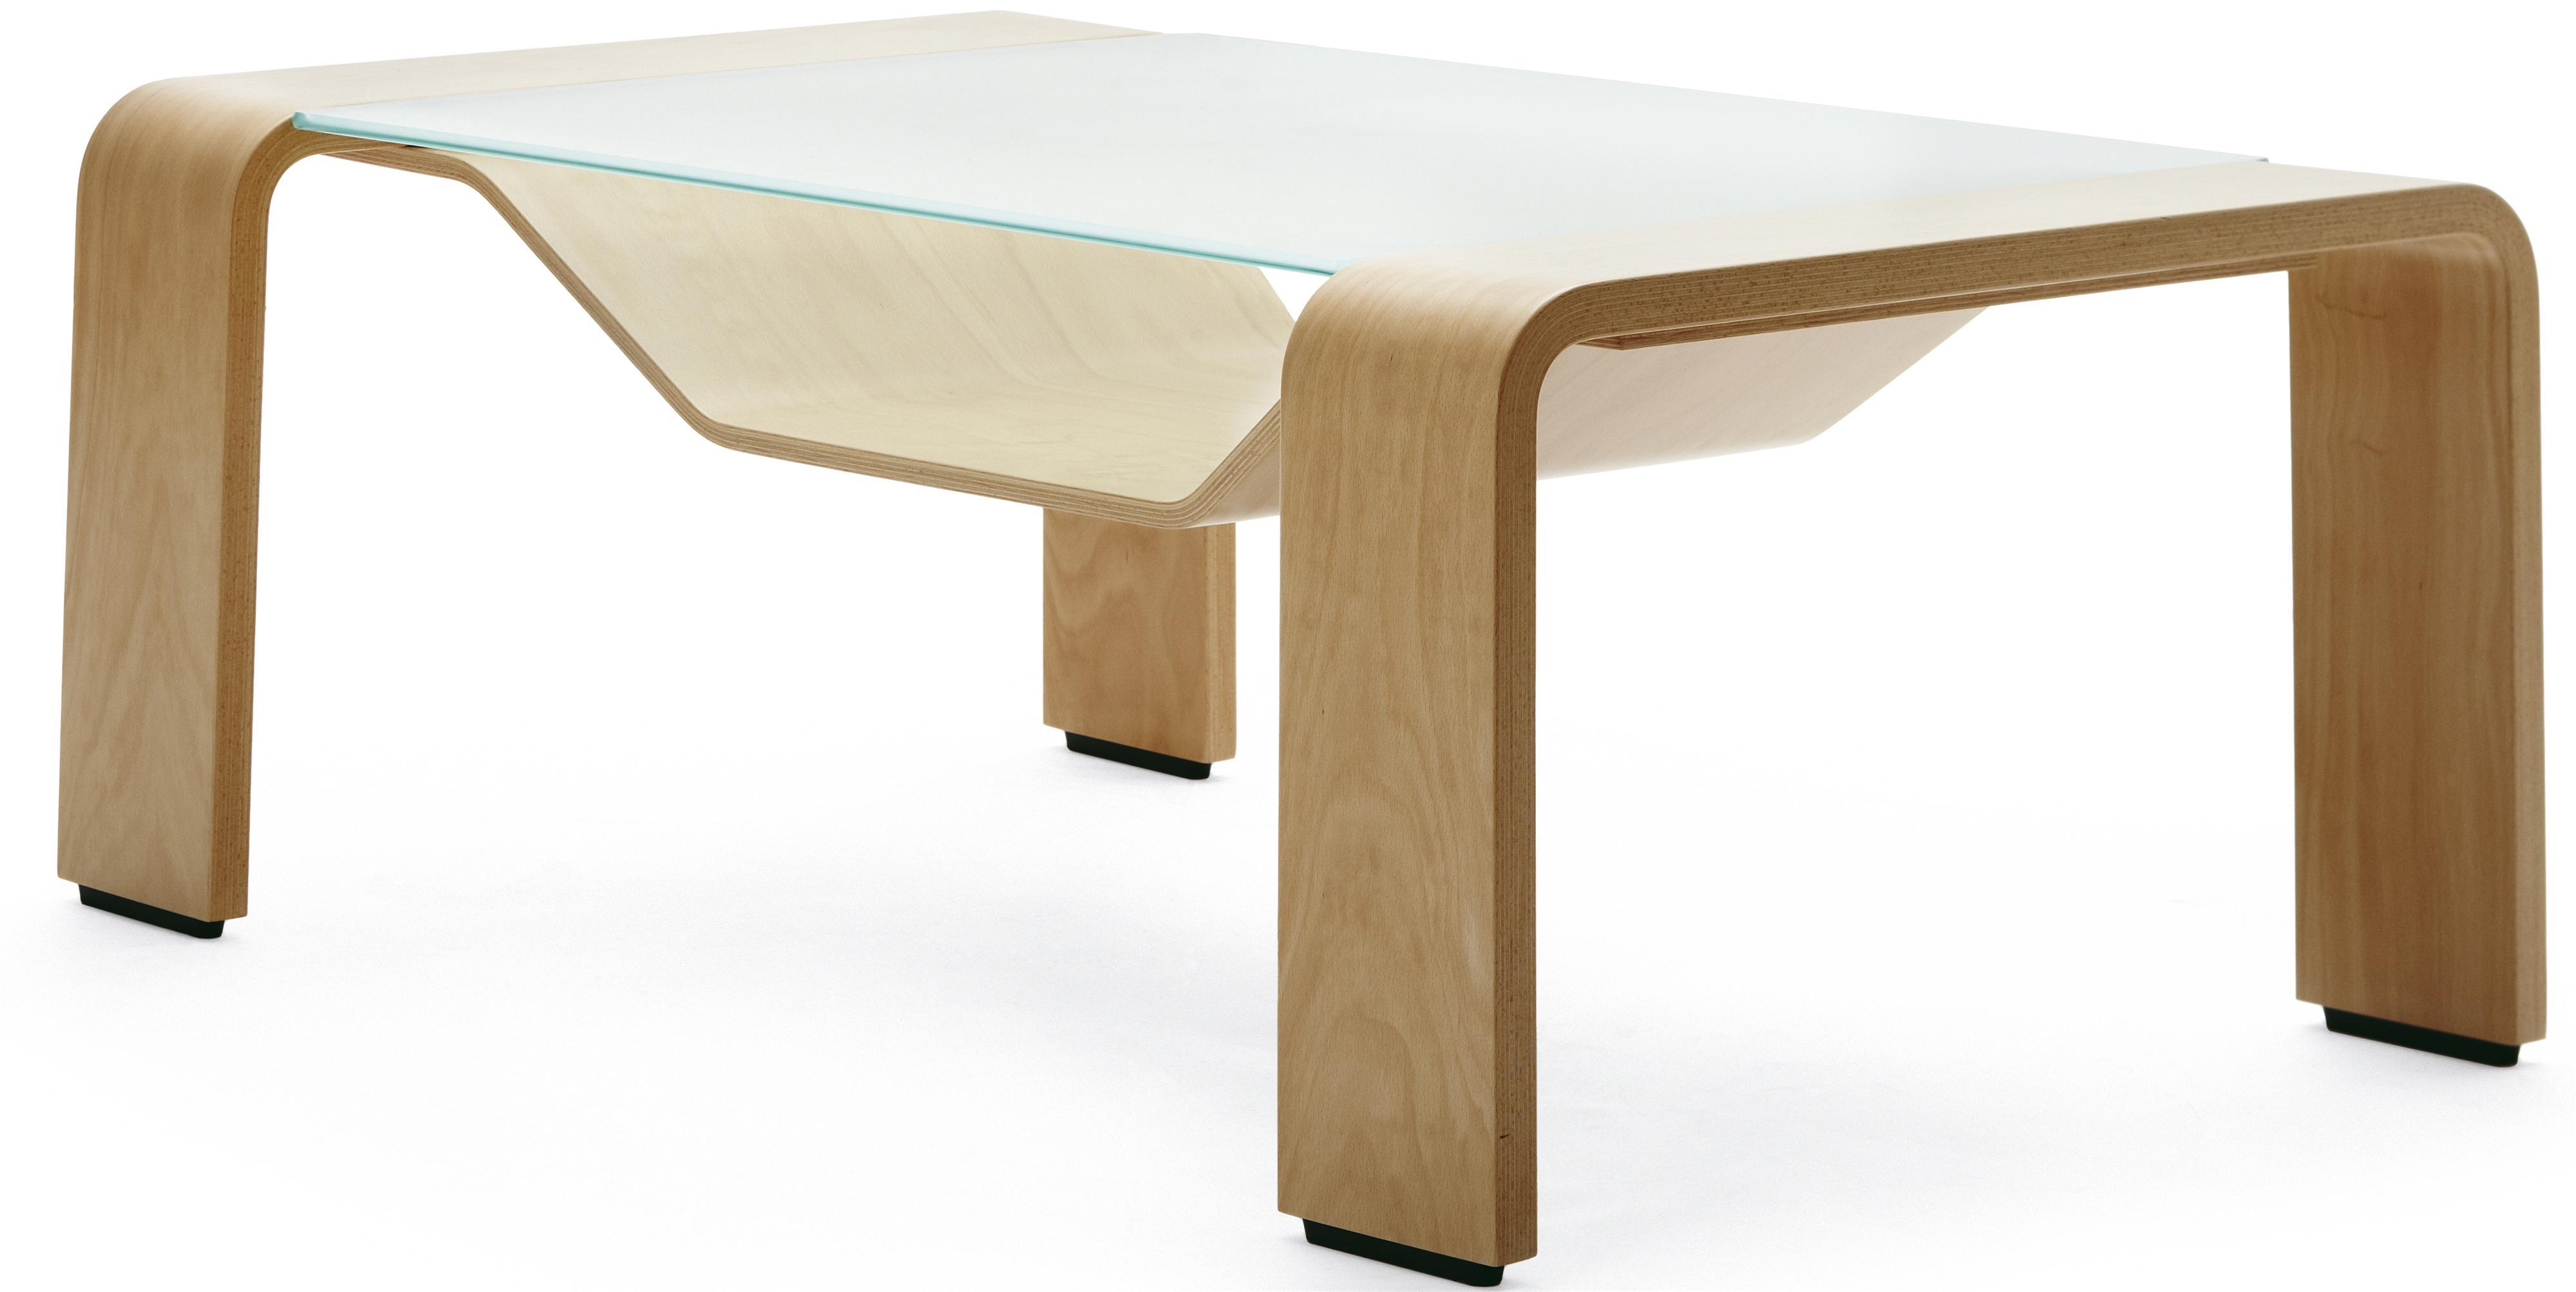 Stressless by Ekornes Tables Pegasus HomeWorld Furniture